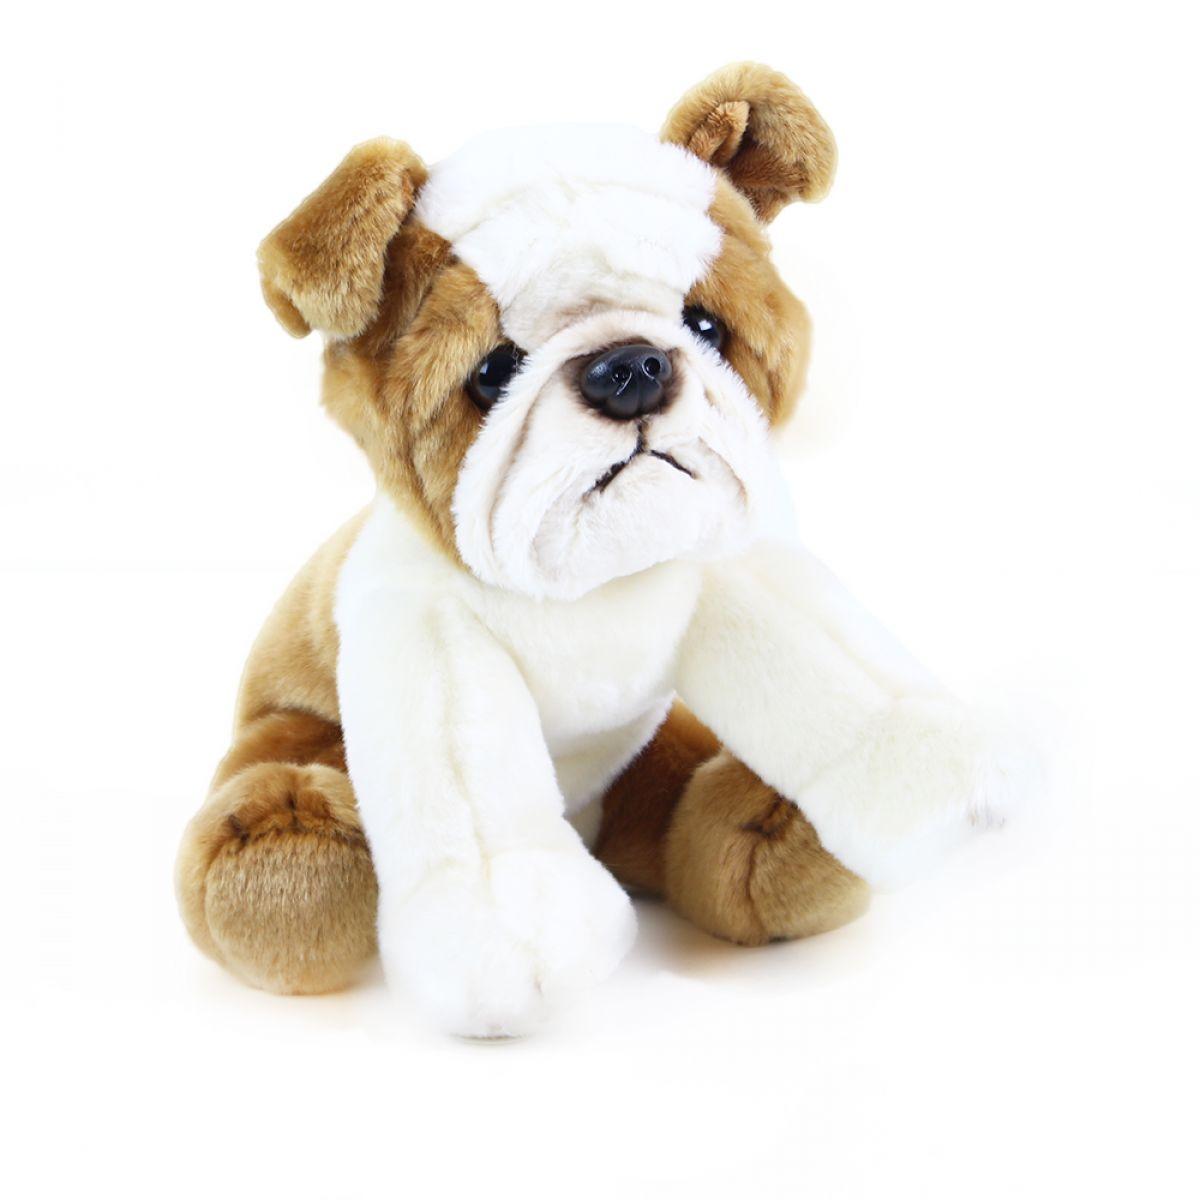 Rappa plyšový pes bulldog 26 cm